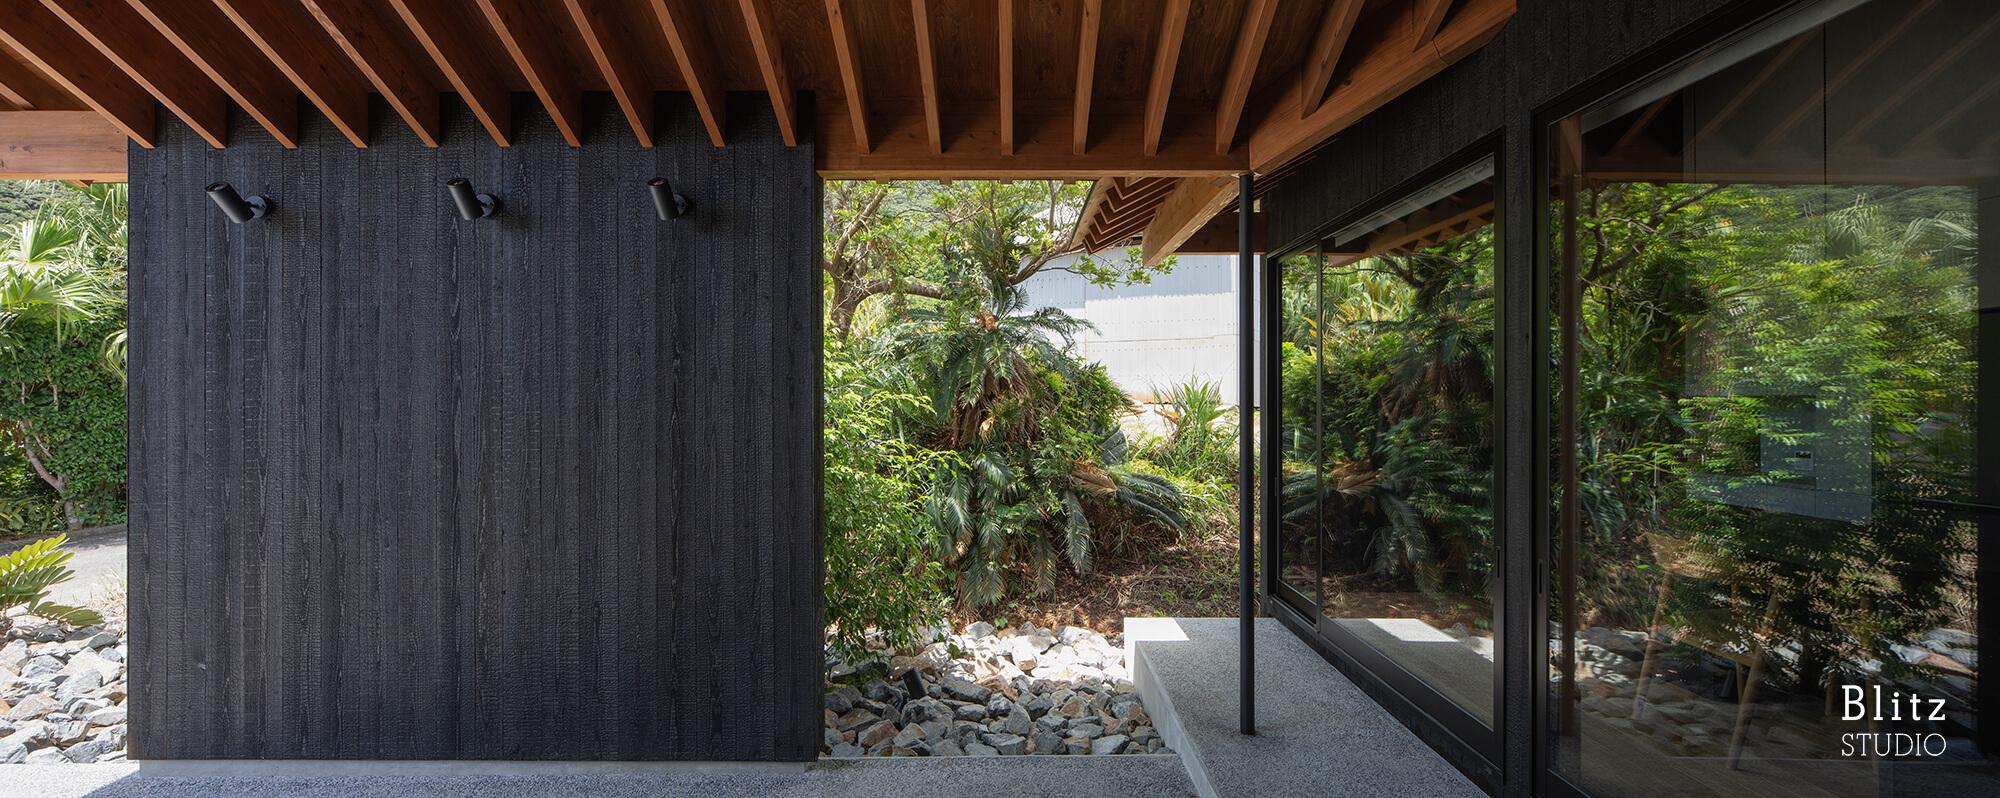 『浦の家』-鹿児島県奄美大島-建築写真・竣工写真・インテリア写真3